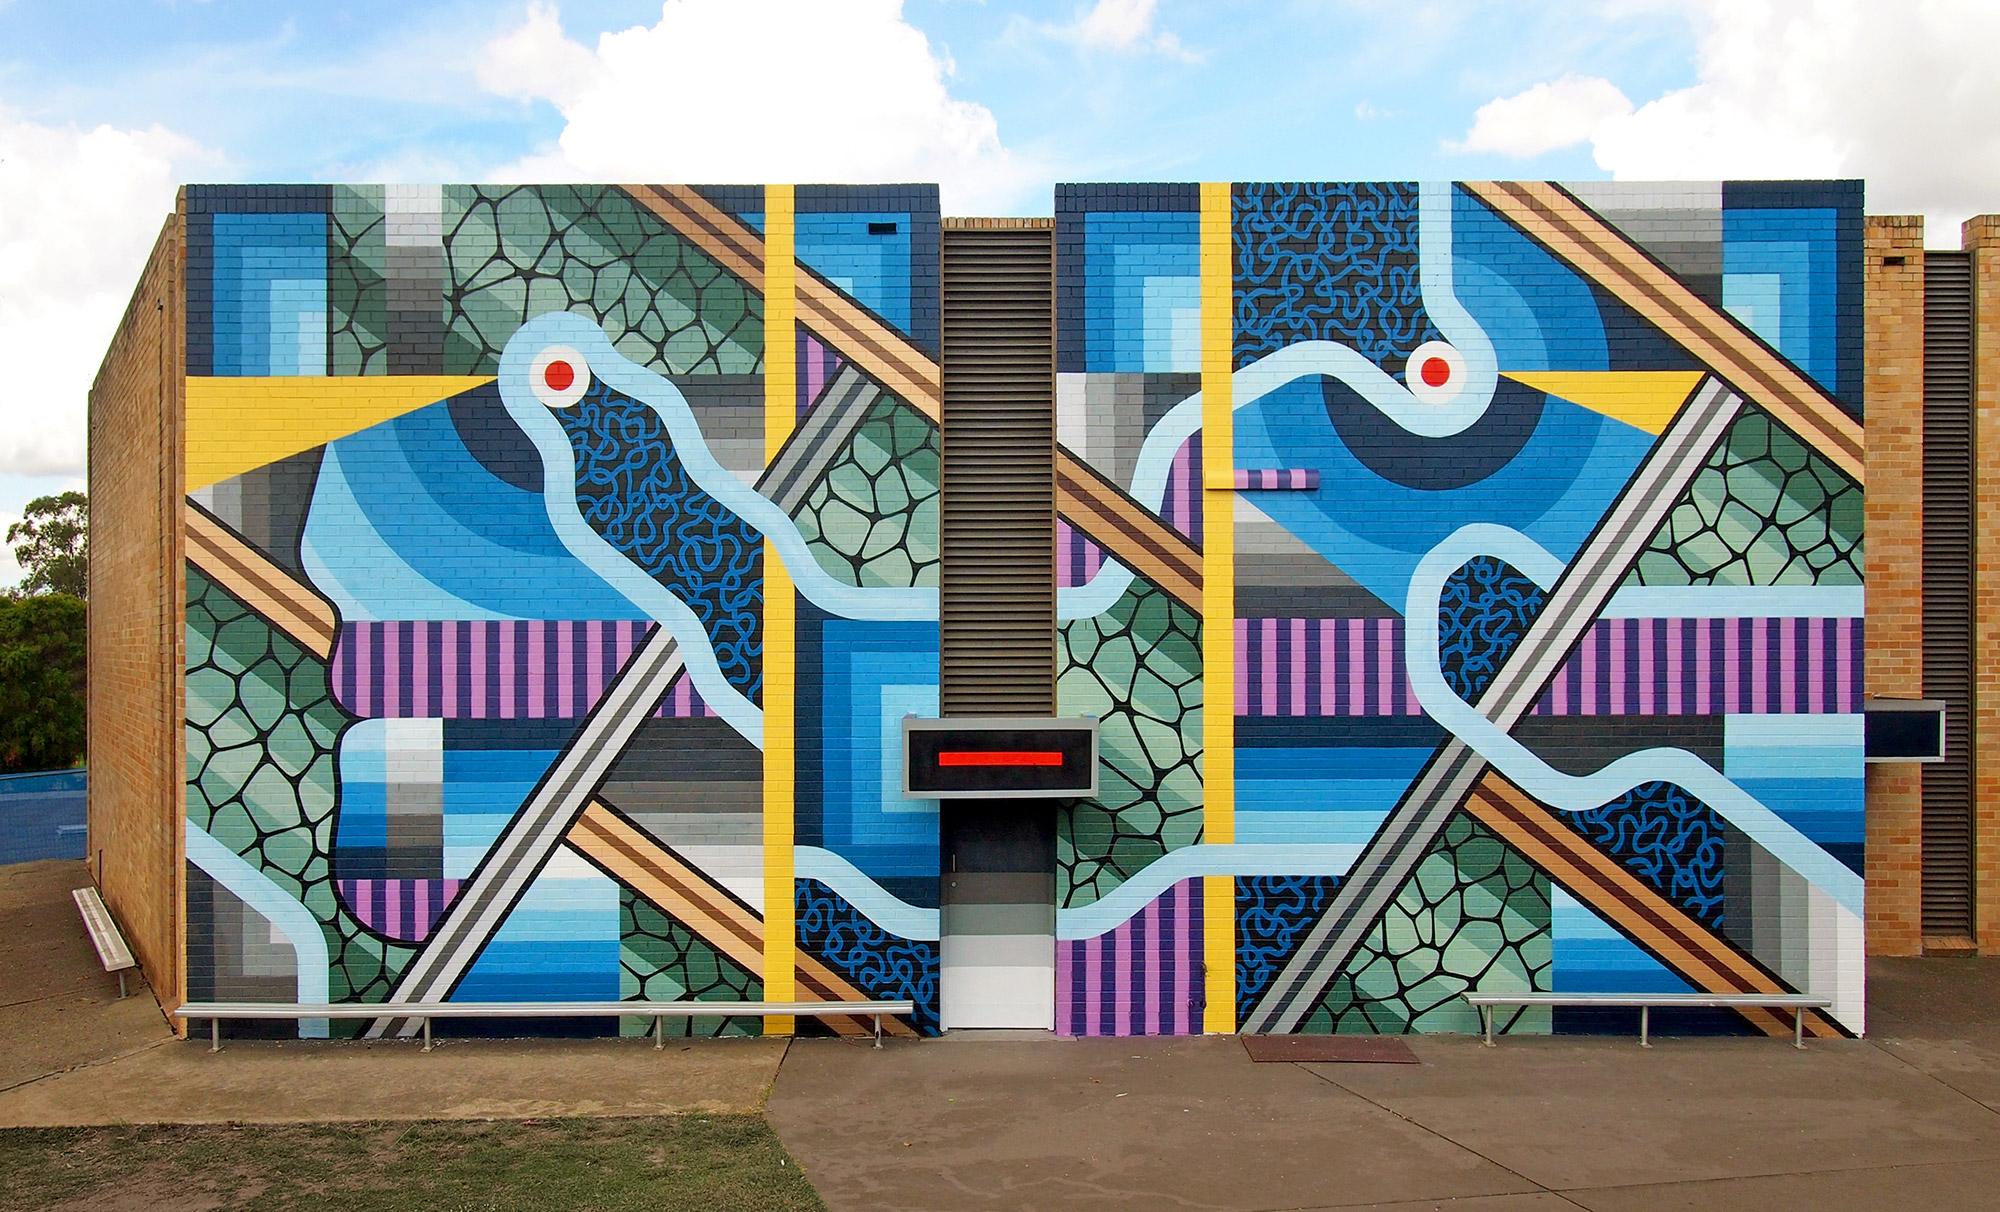 DOONSIDE TECHNOLOGY HIGH SCHOOL, NSW AUSTRALIA